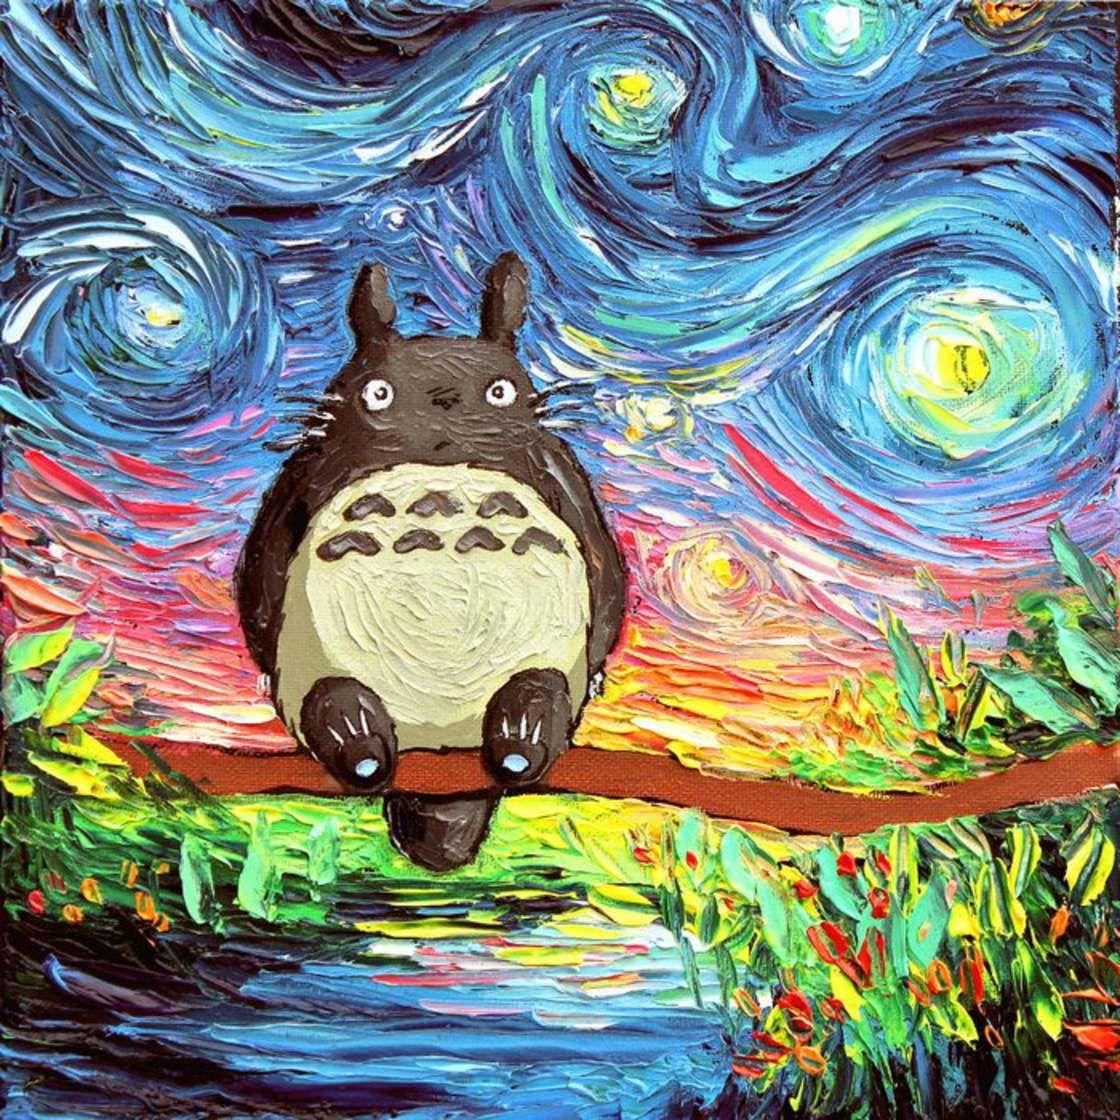 Beliebt Starry Night – Quand Van Gogh rencontre la Pop Culture | La nuit  KJ32